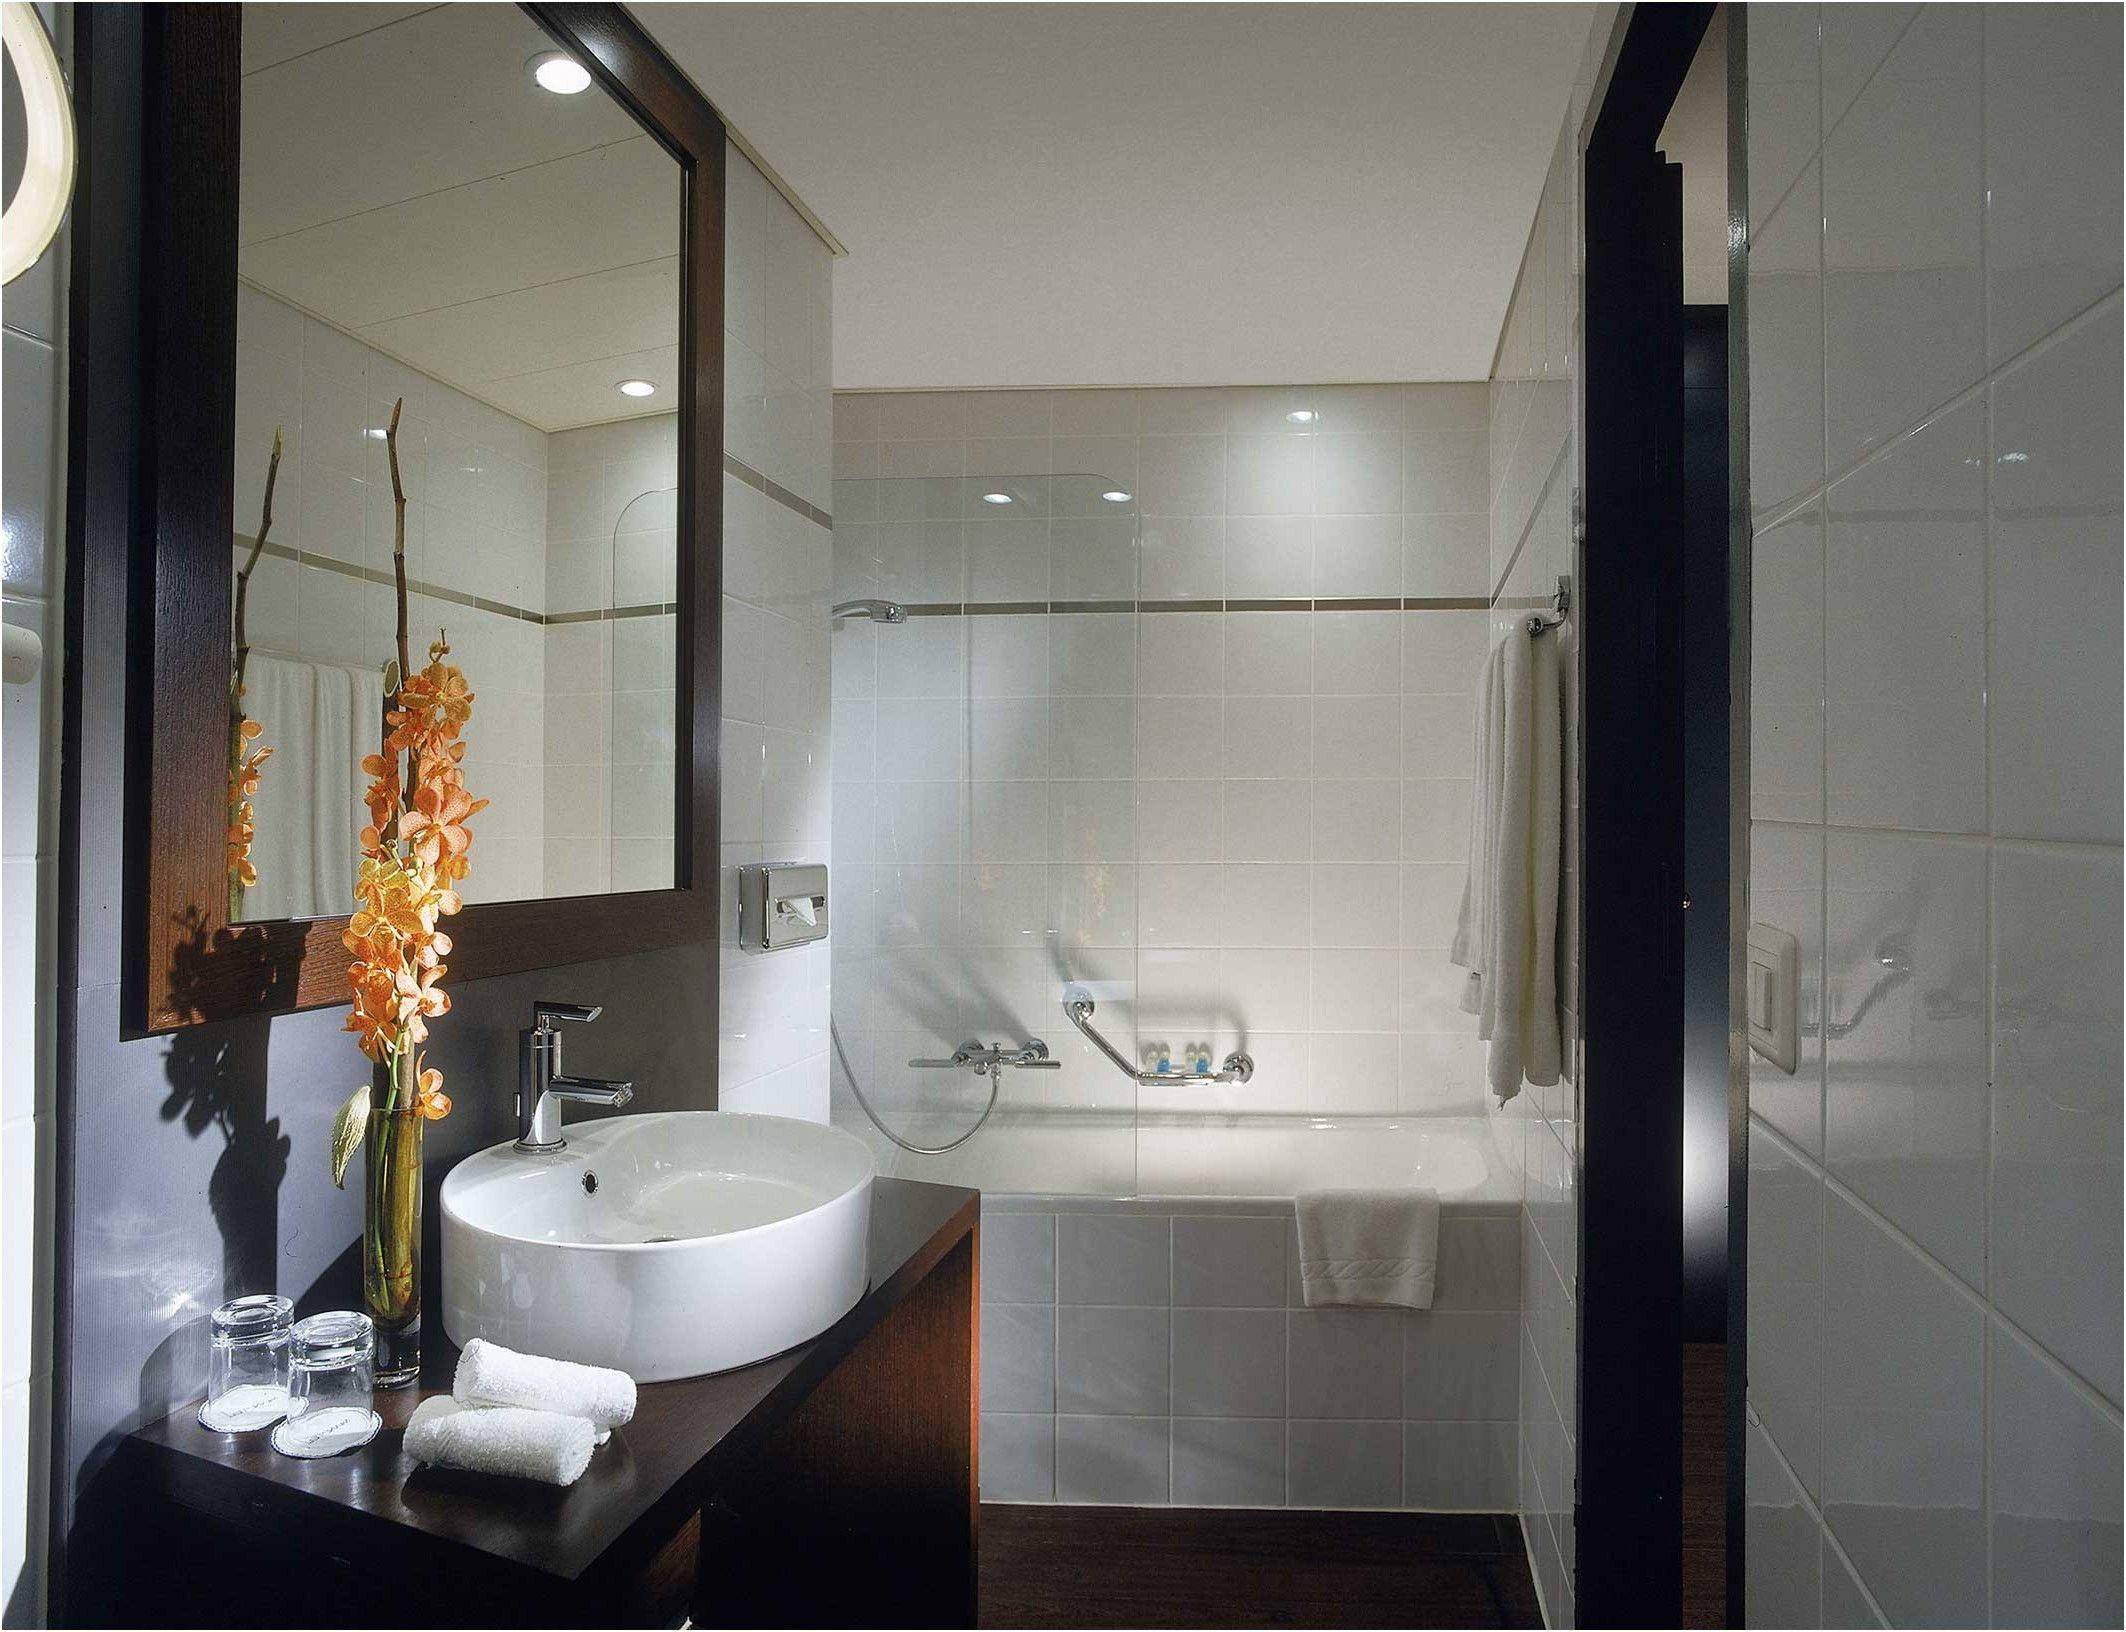 Small Hotel Bathroom Design Fascinating Small Hotel Bathroom From Small  Hotel Bathroom Design